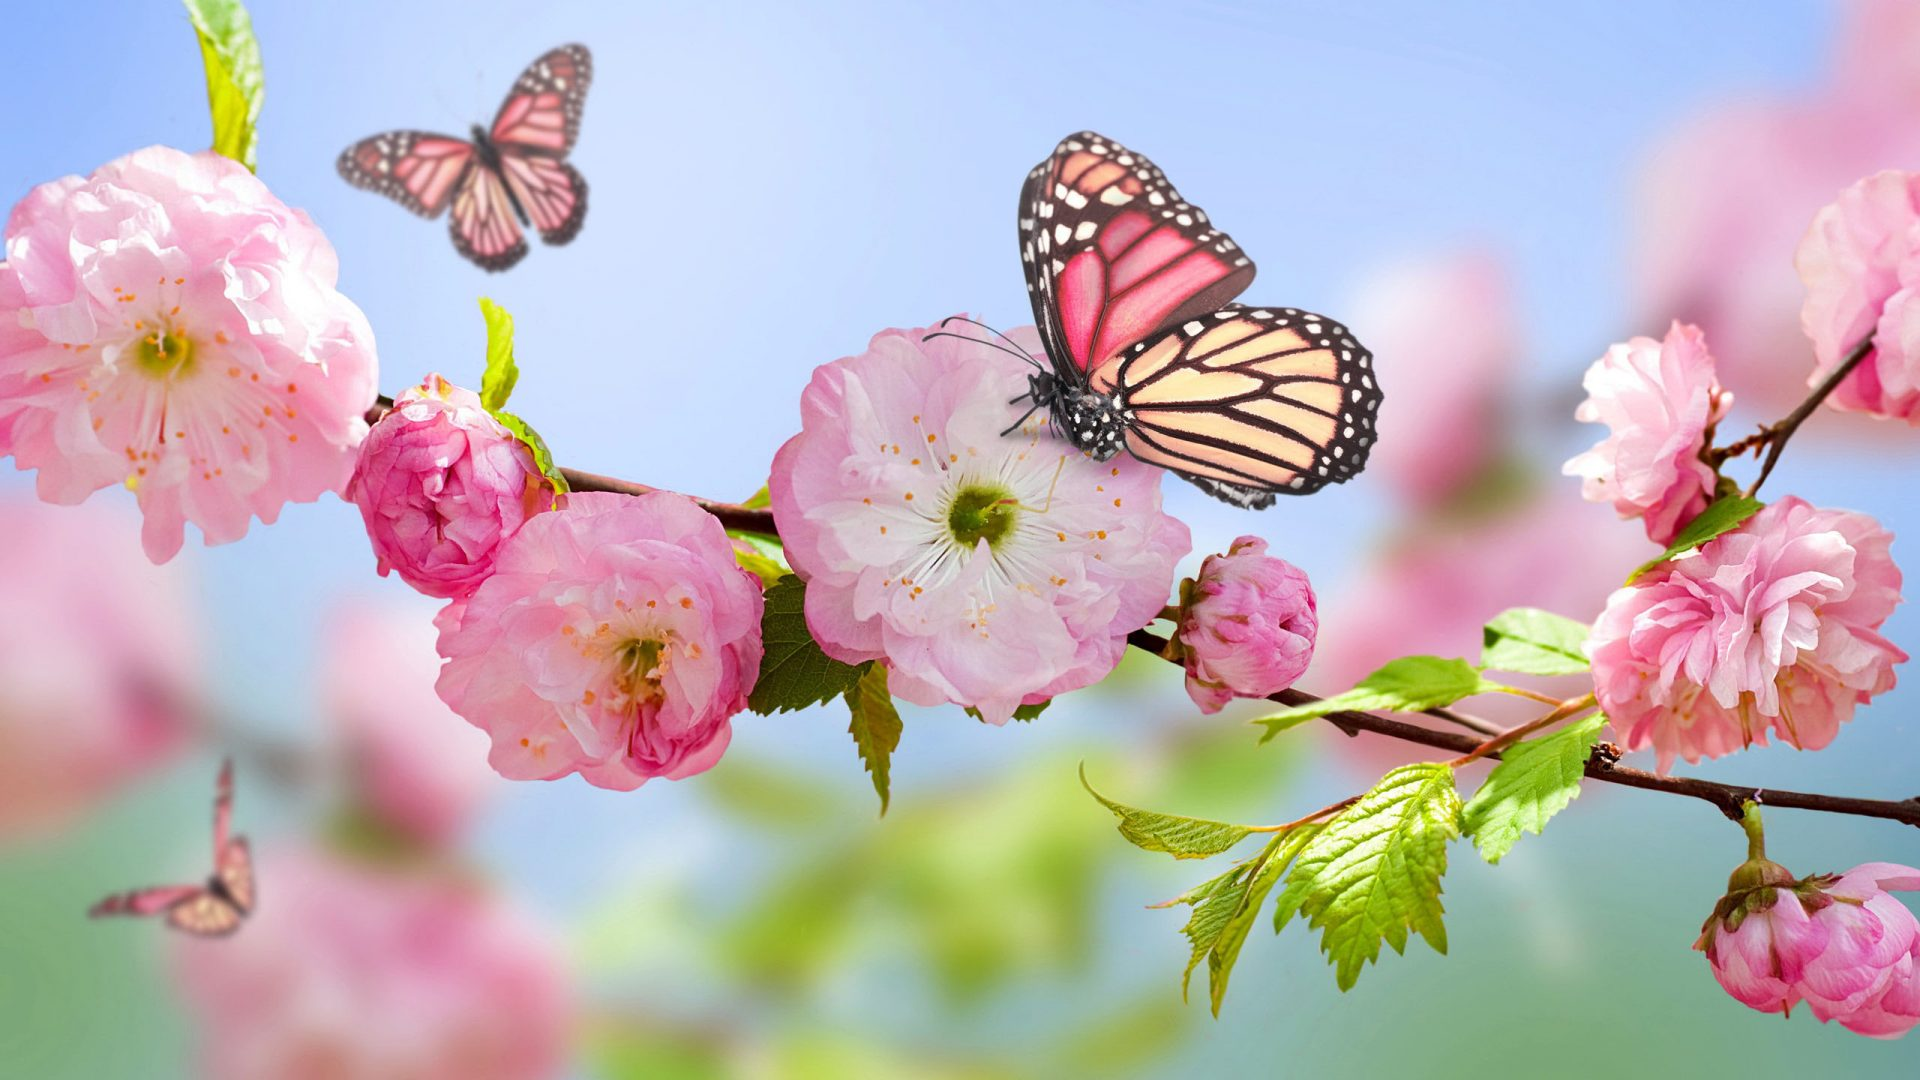 Stunning-Spring-1920x1080